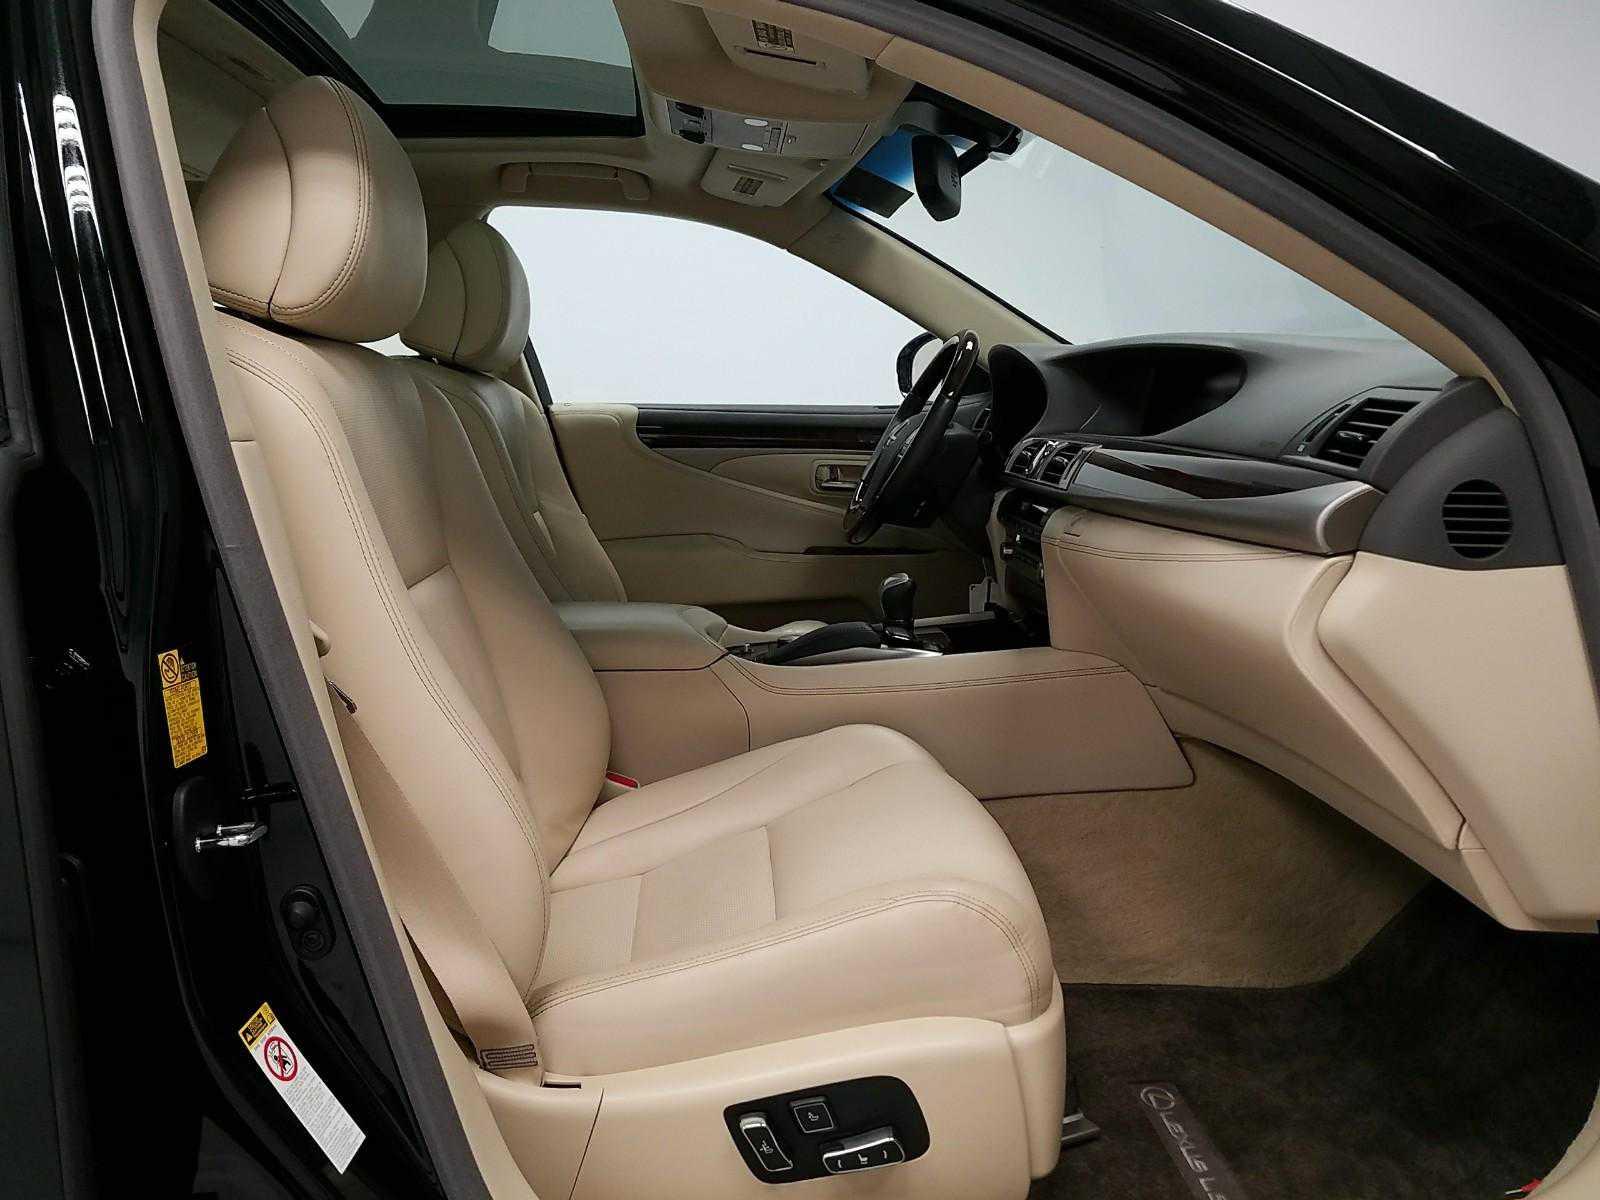 Lexus' front seats